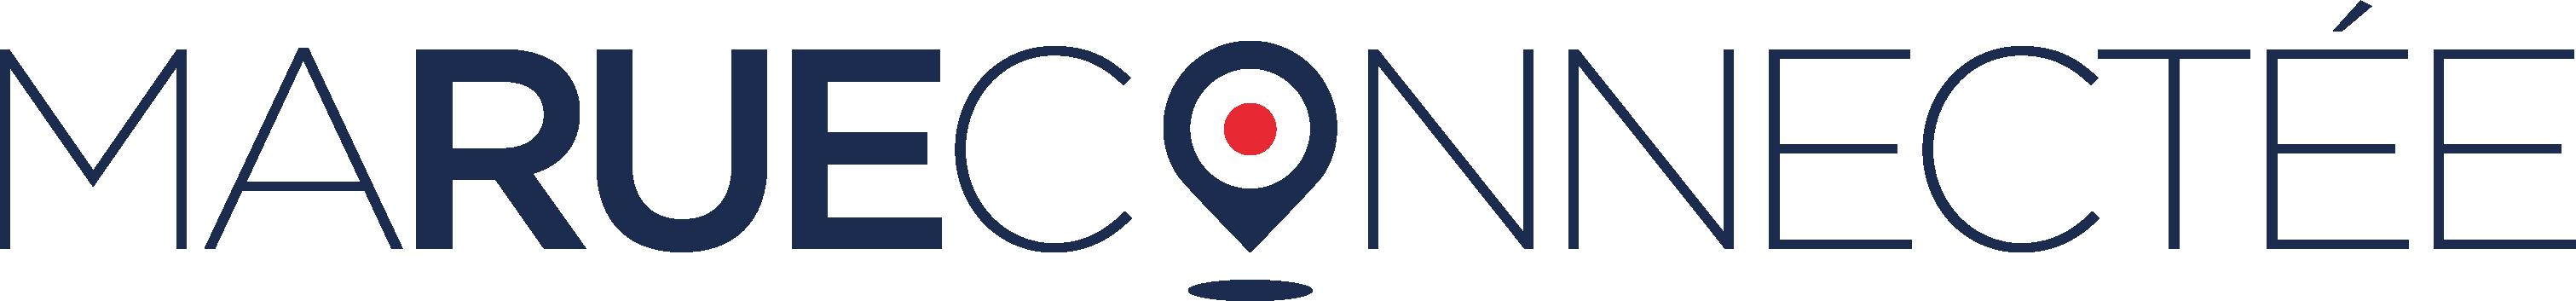 MA RUE CONNECTÉE logo